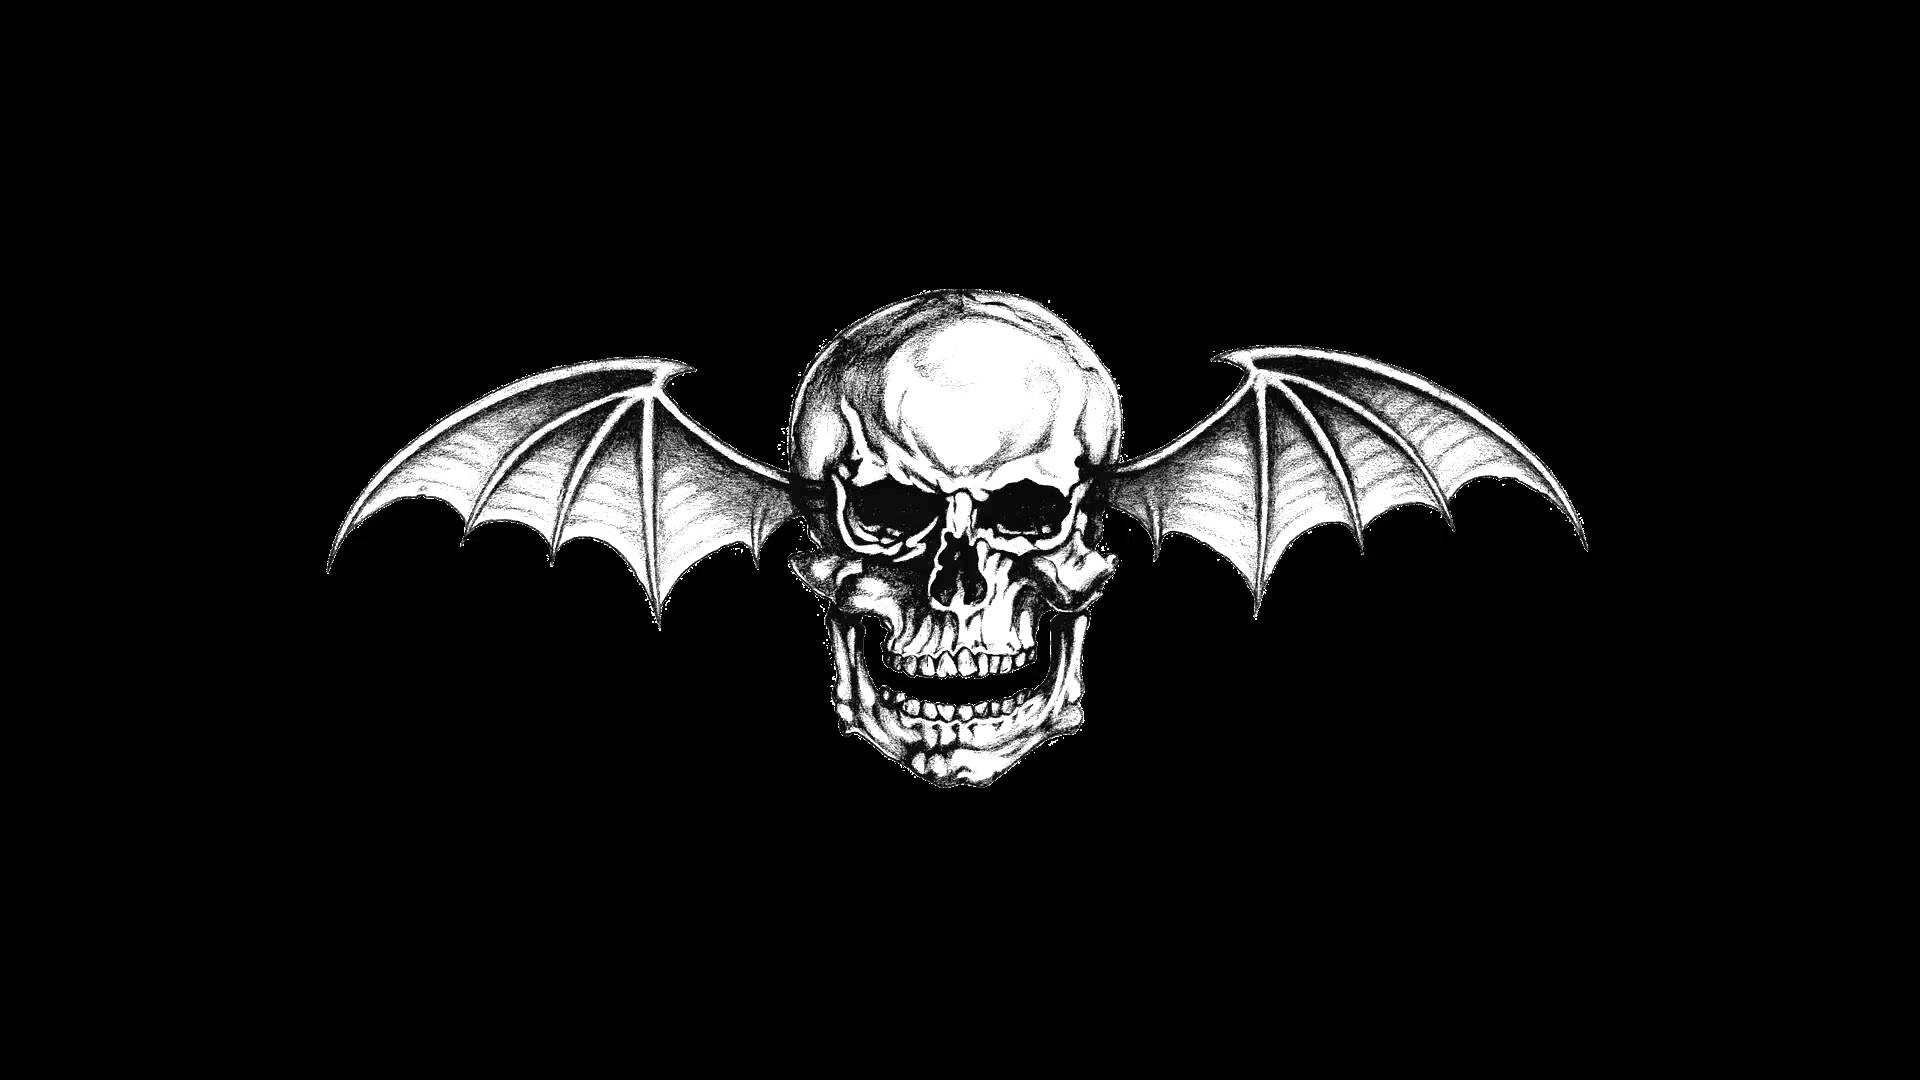 Avenged Sevenfold Deathbat Wallpaper 75 Images